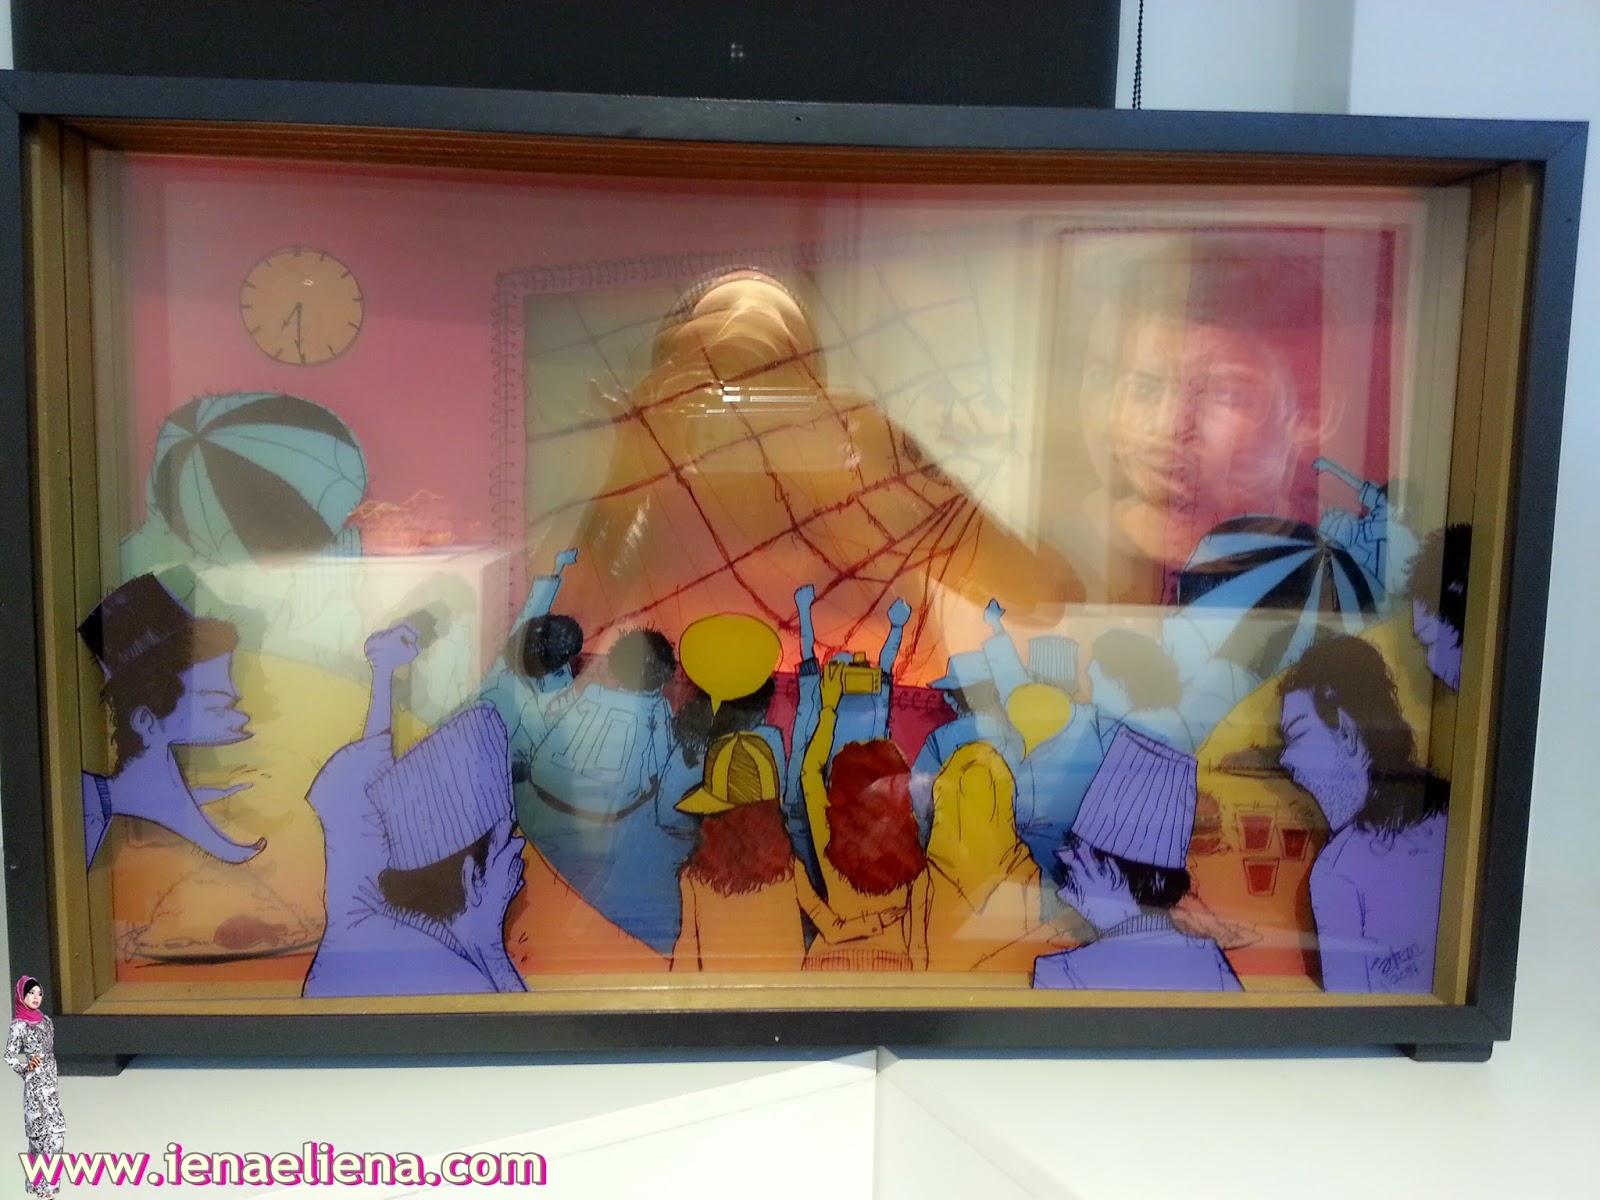 Ruang Kreatif Nando's Chinatown : LOT123